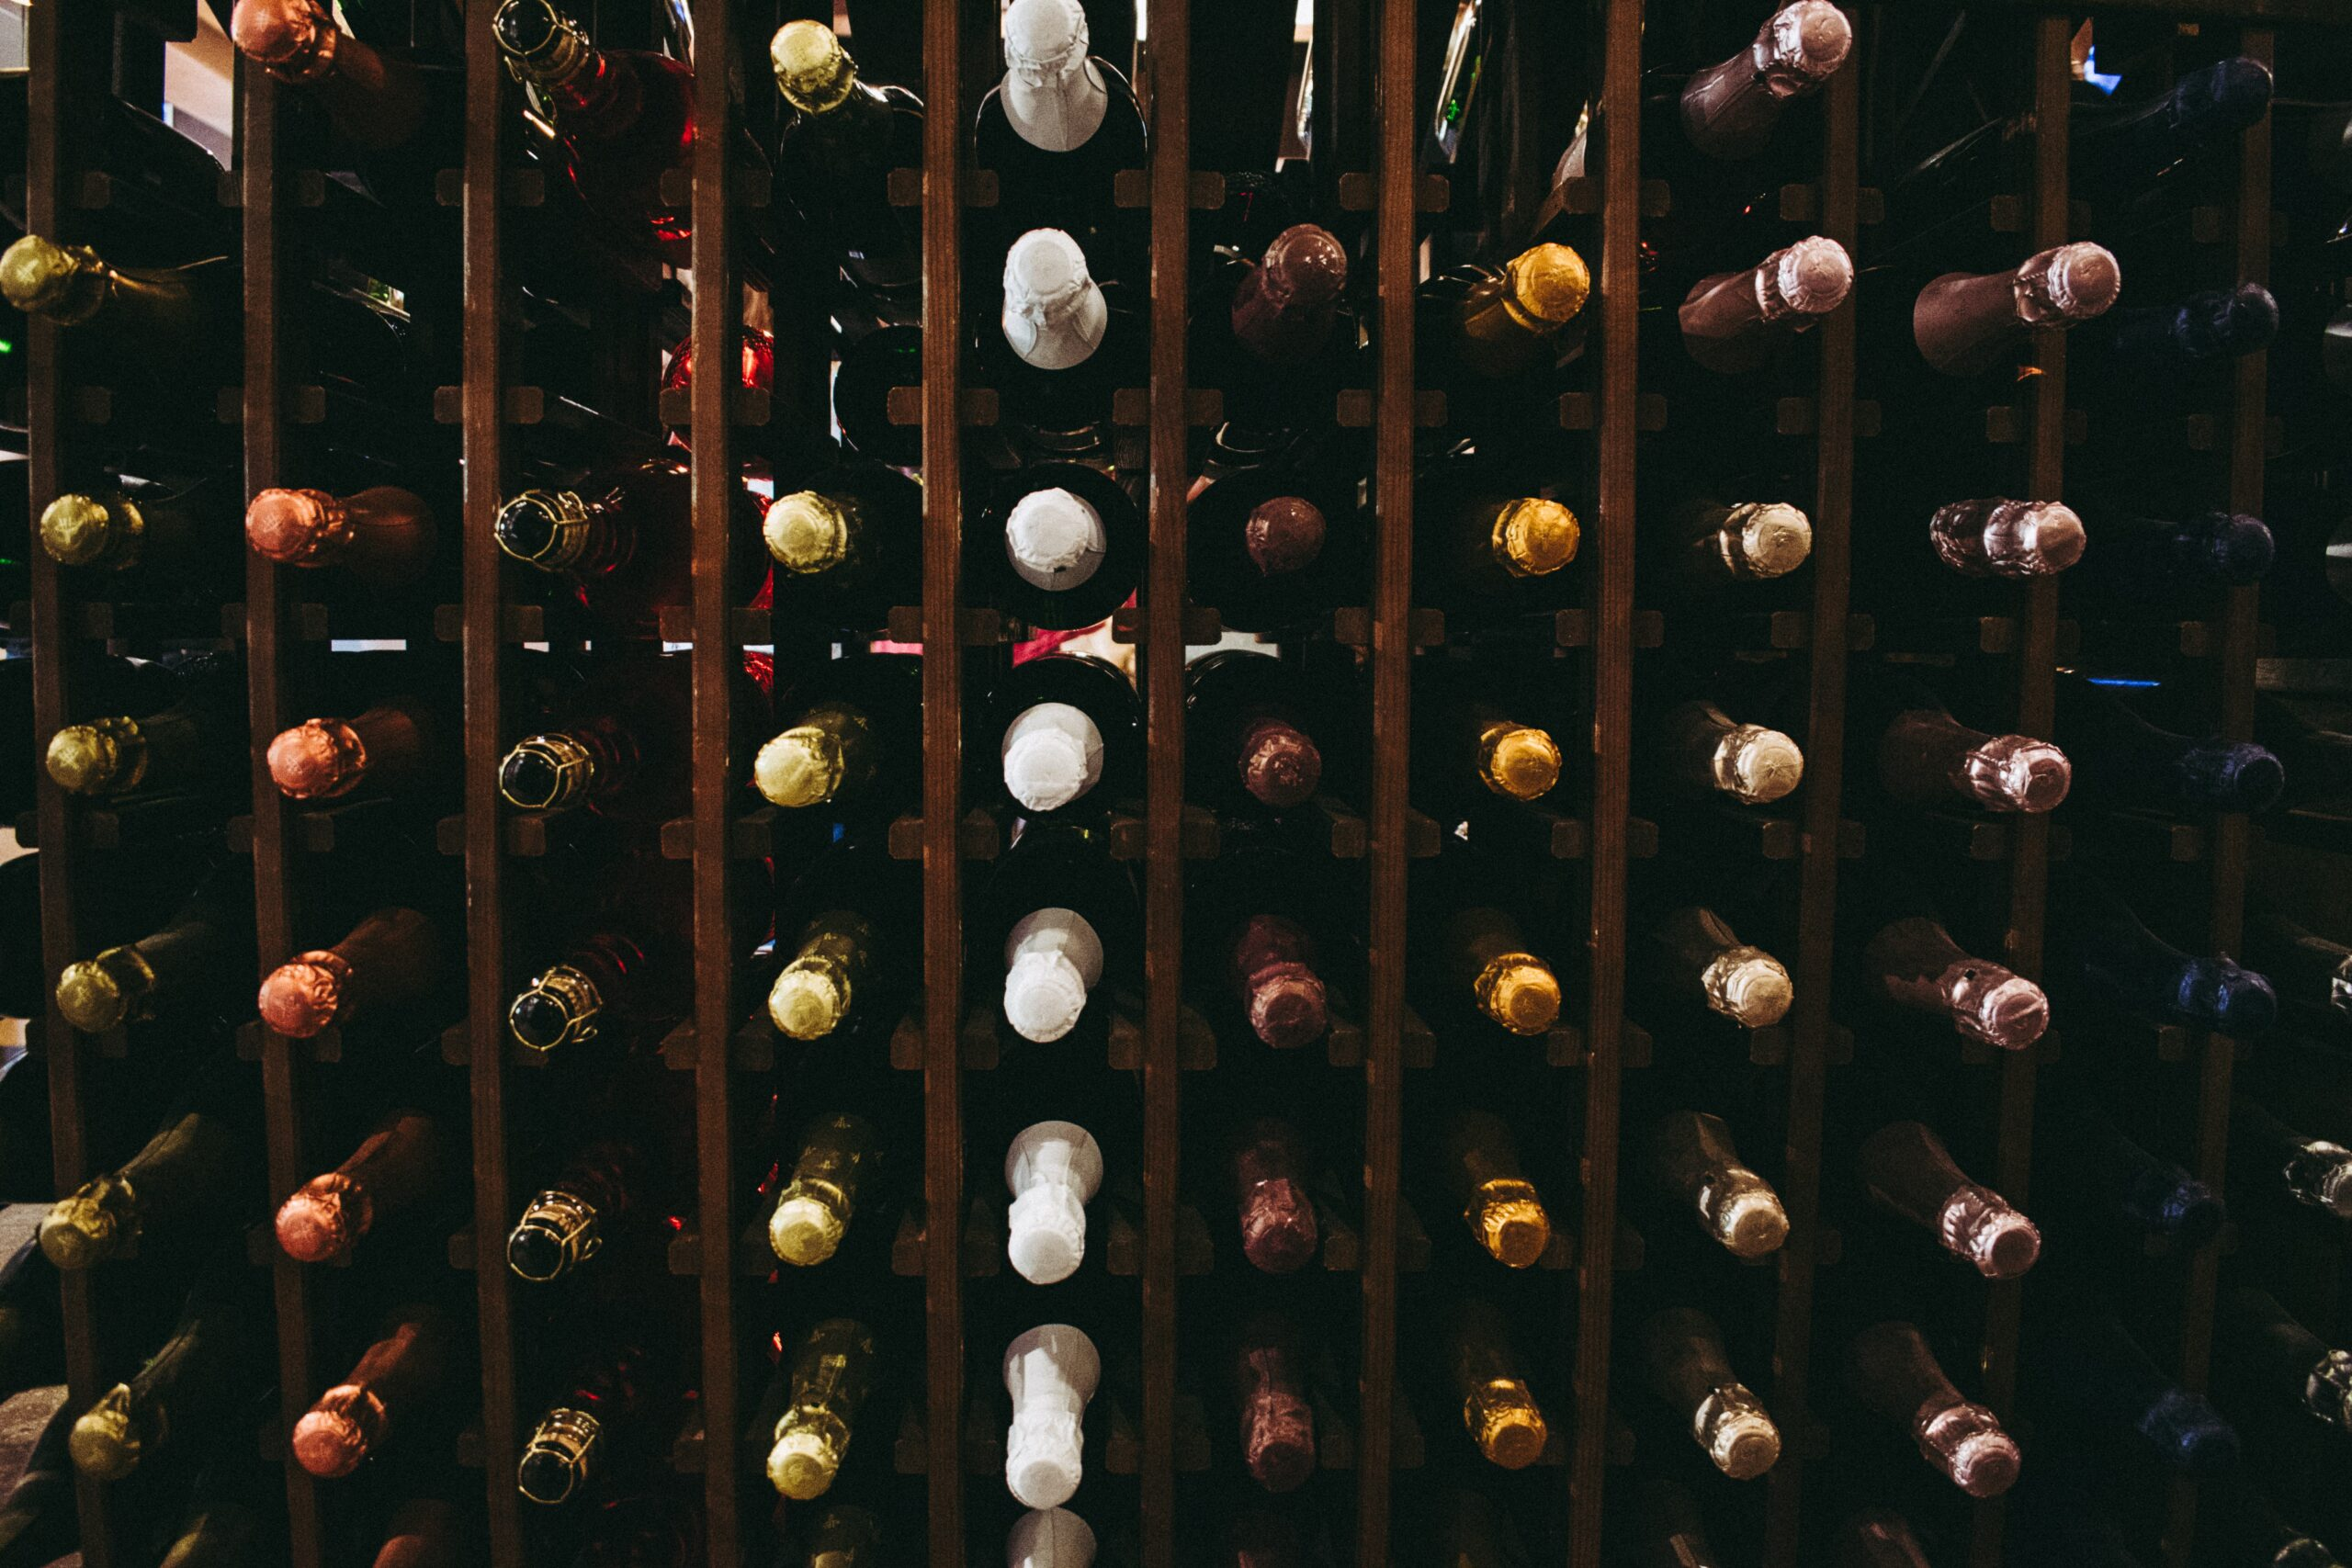 ingrosso-vino-bianco-rosso-spumanti-torino-cosmodrink